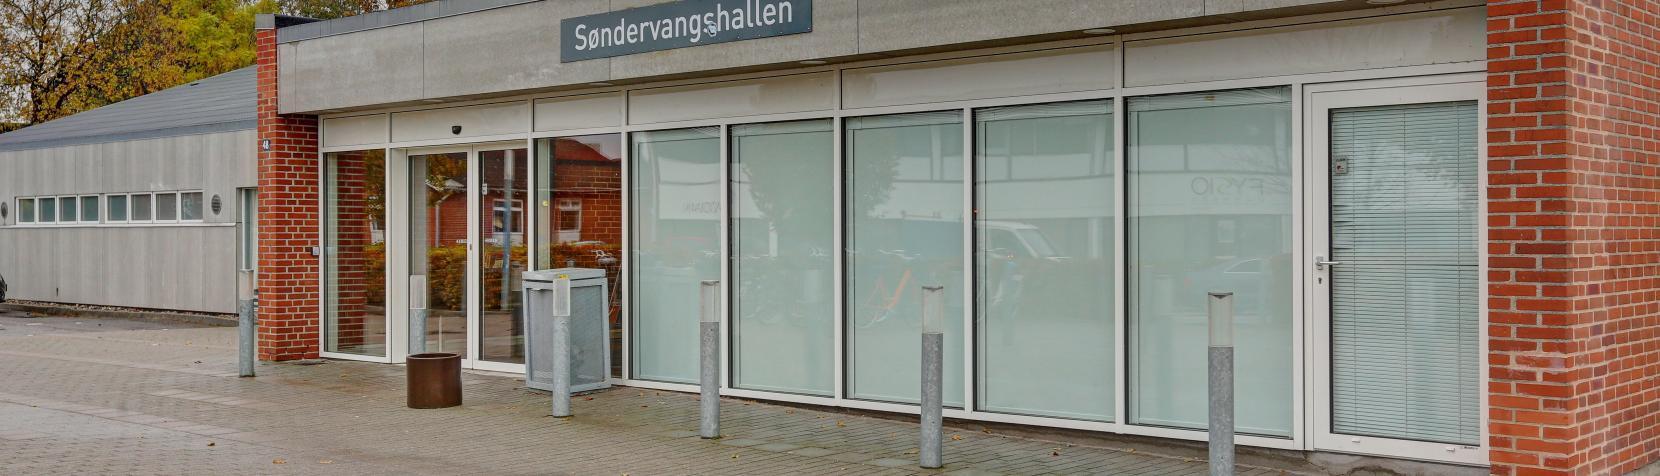 Foto: Søndervangshallen